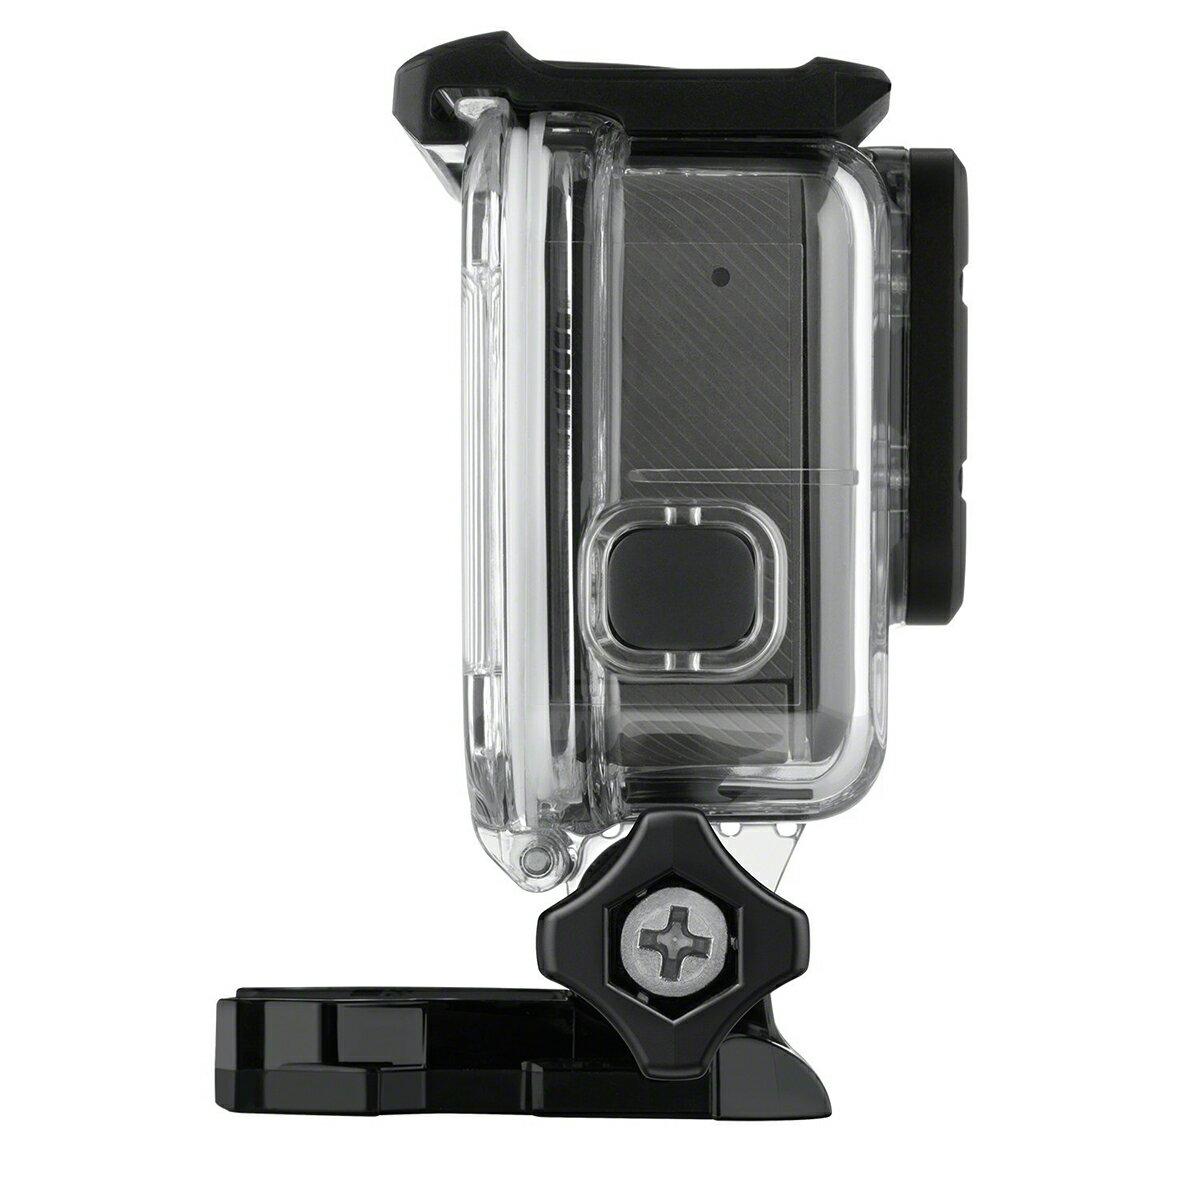 GoPro Super Suit HERO6 Black/HERO5 Black対応 総合保護 + ダイブハウジング AADIV-001 【GoPro公式】